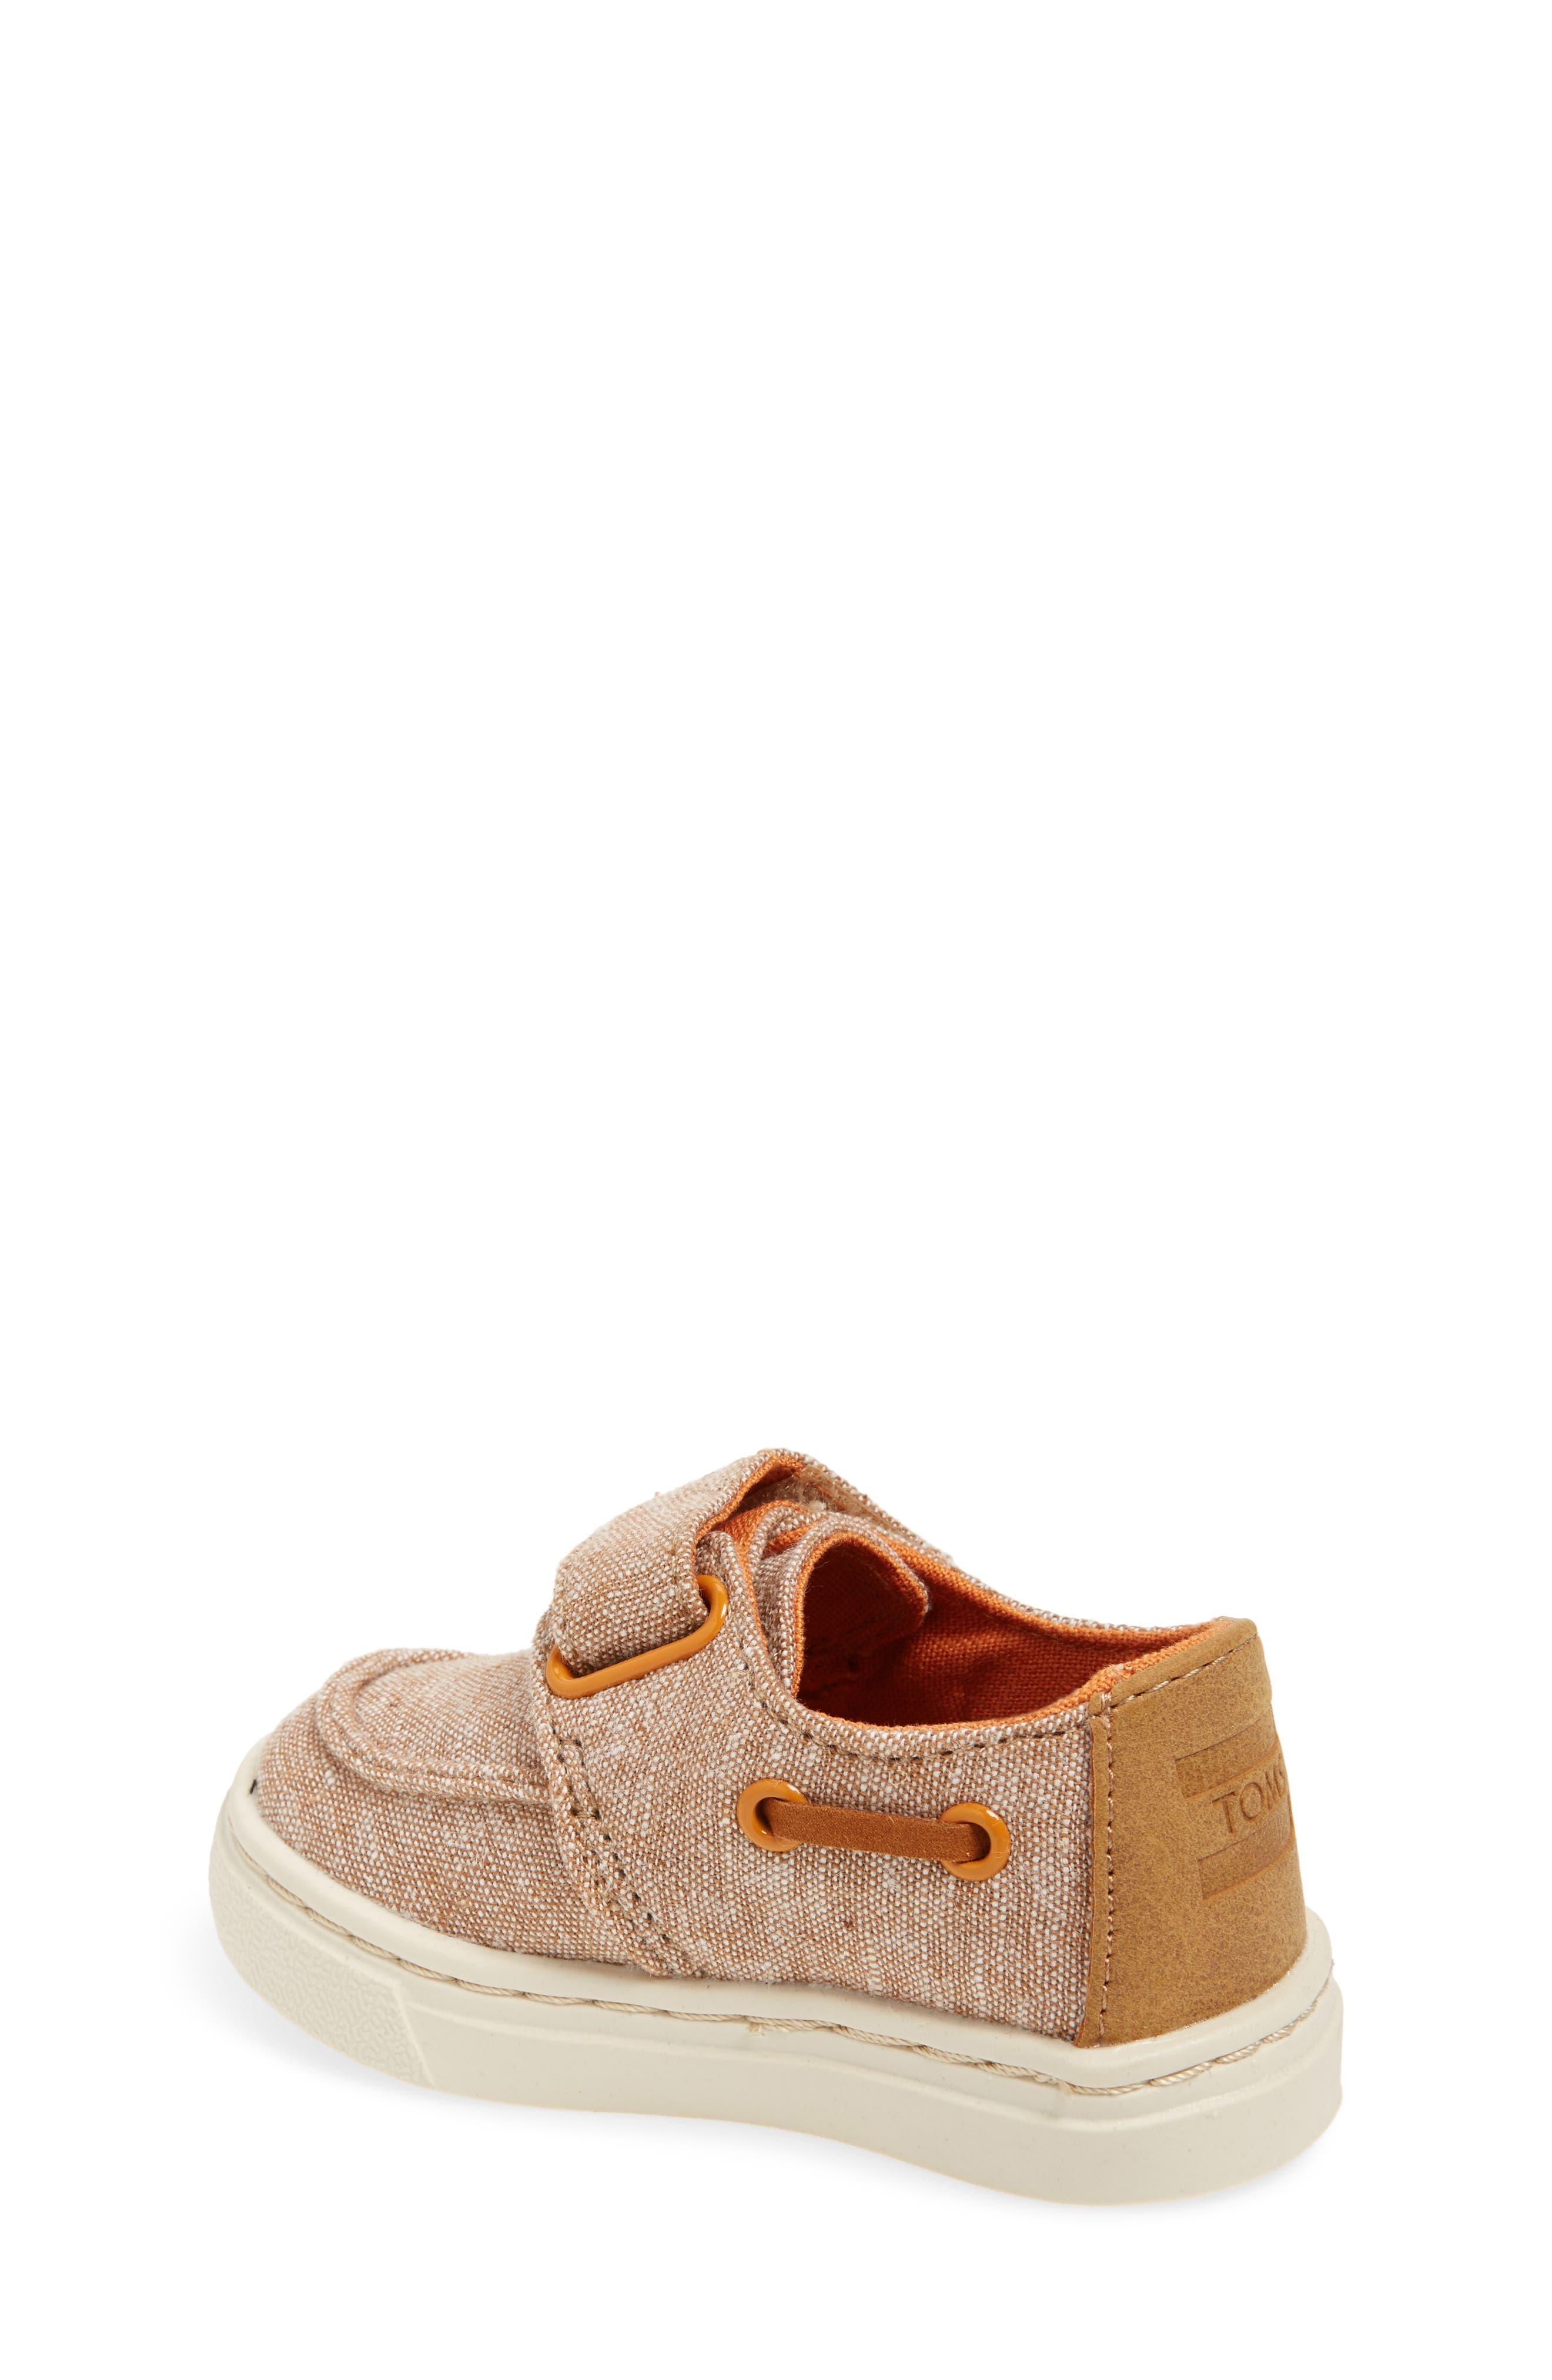 sandals toms shoes footwear fashion crib cribs toomey designer luxury comfort lindsay star kids madeinusa